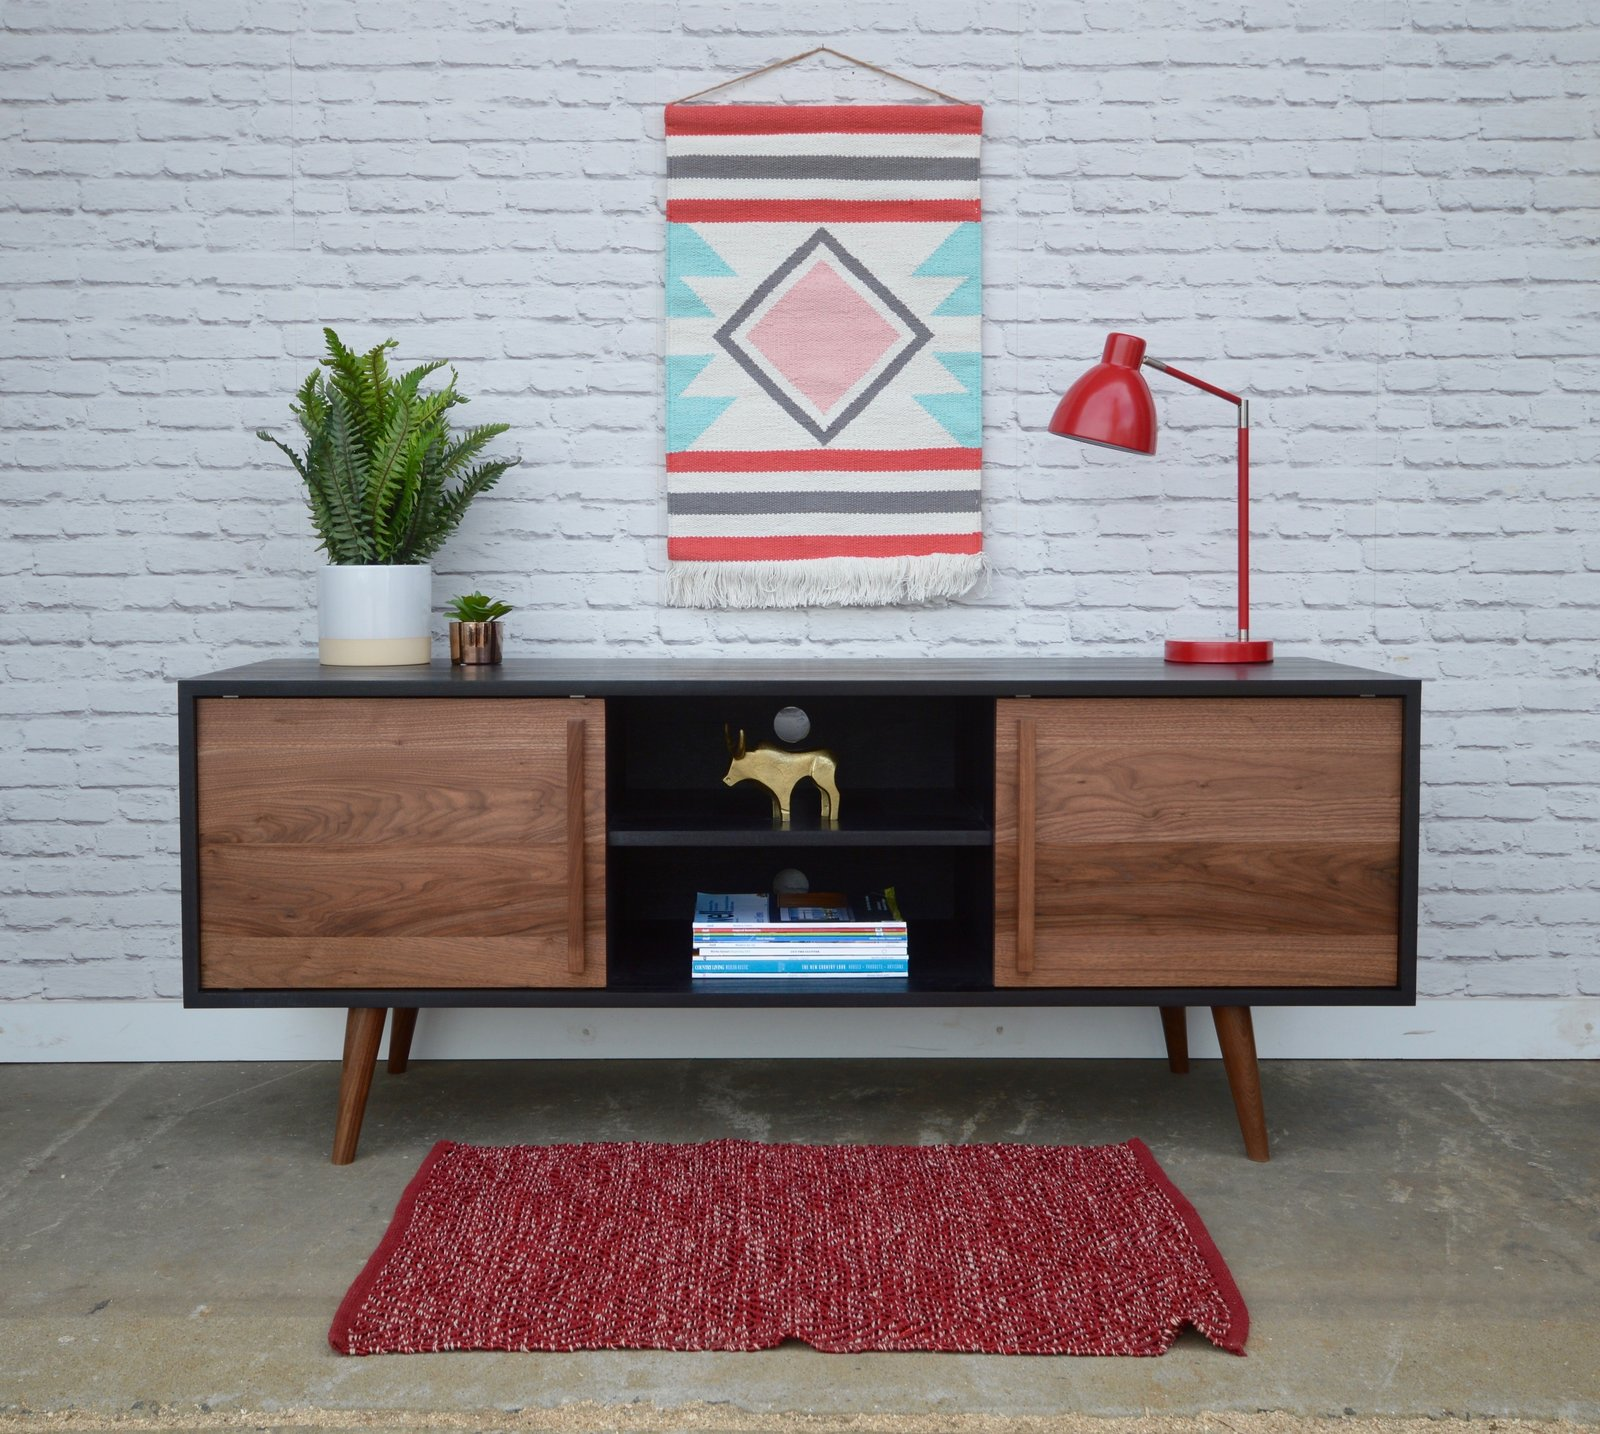 Kasse credenza  Credenzas & TV Stands by STOR New York - Handmade Furniture